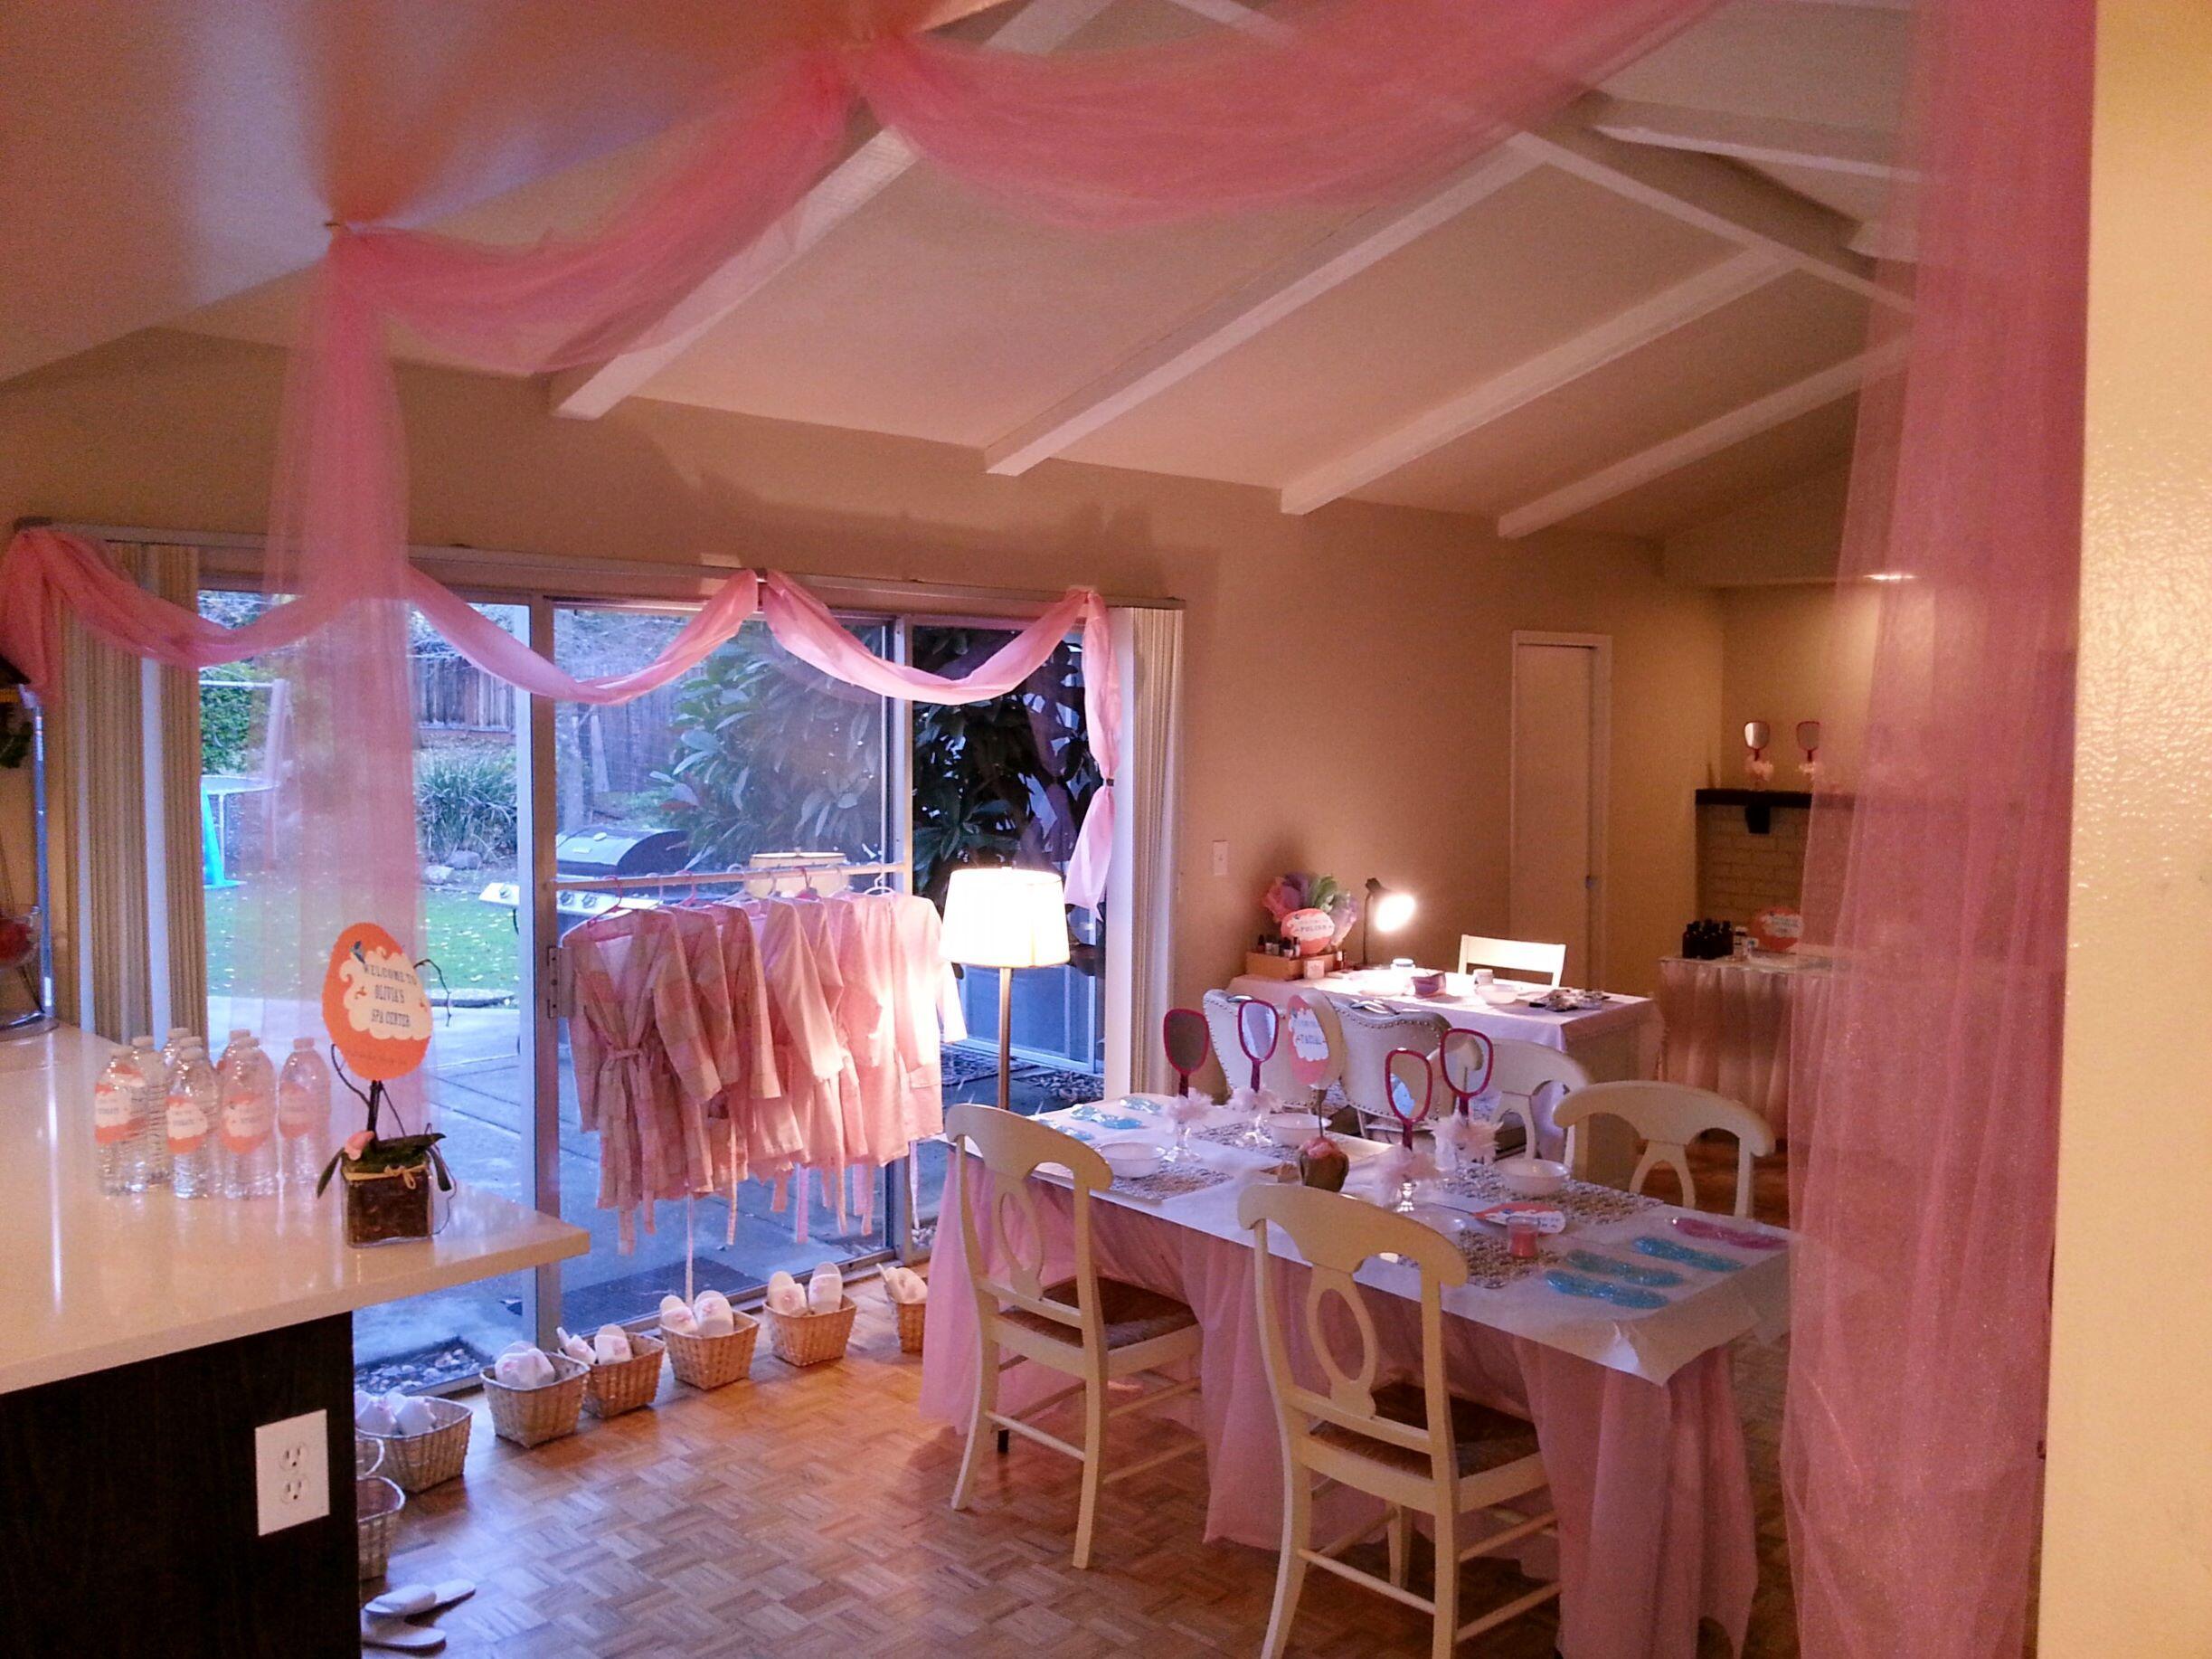 Spa Party Idea: Tranform your family room into a spa!! Livie's 9th Birthday Party